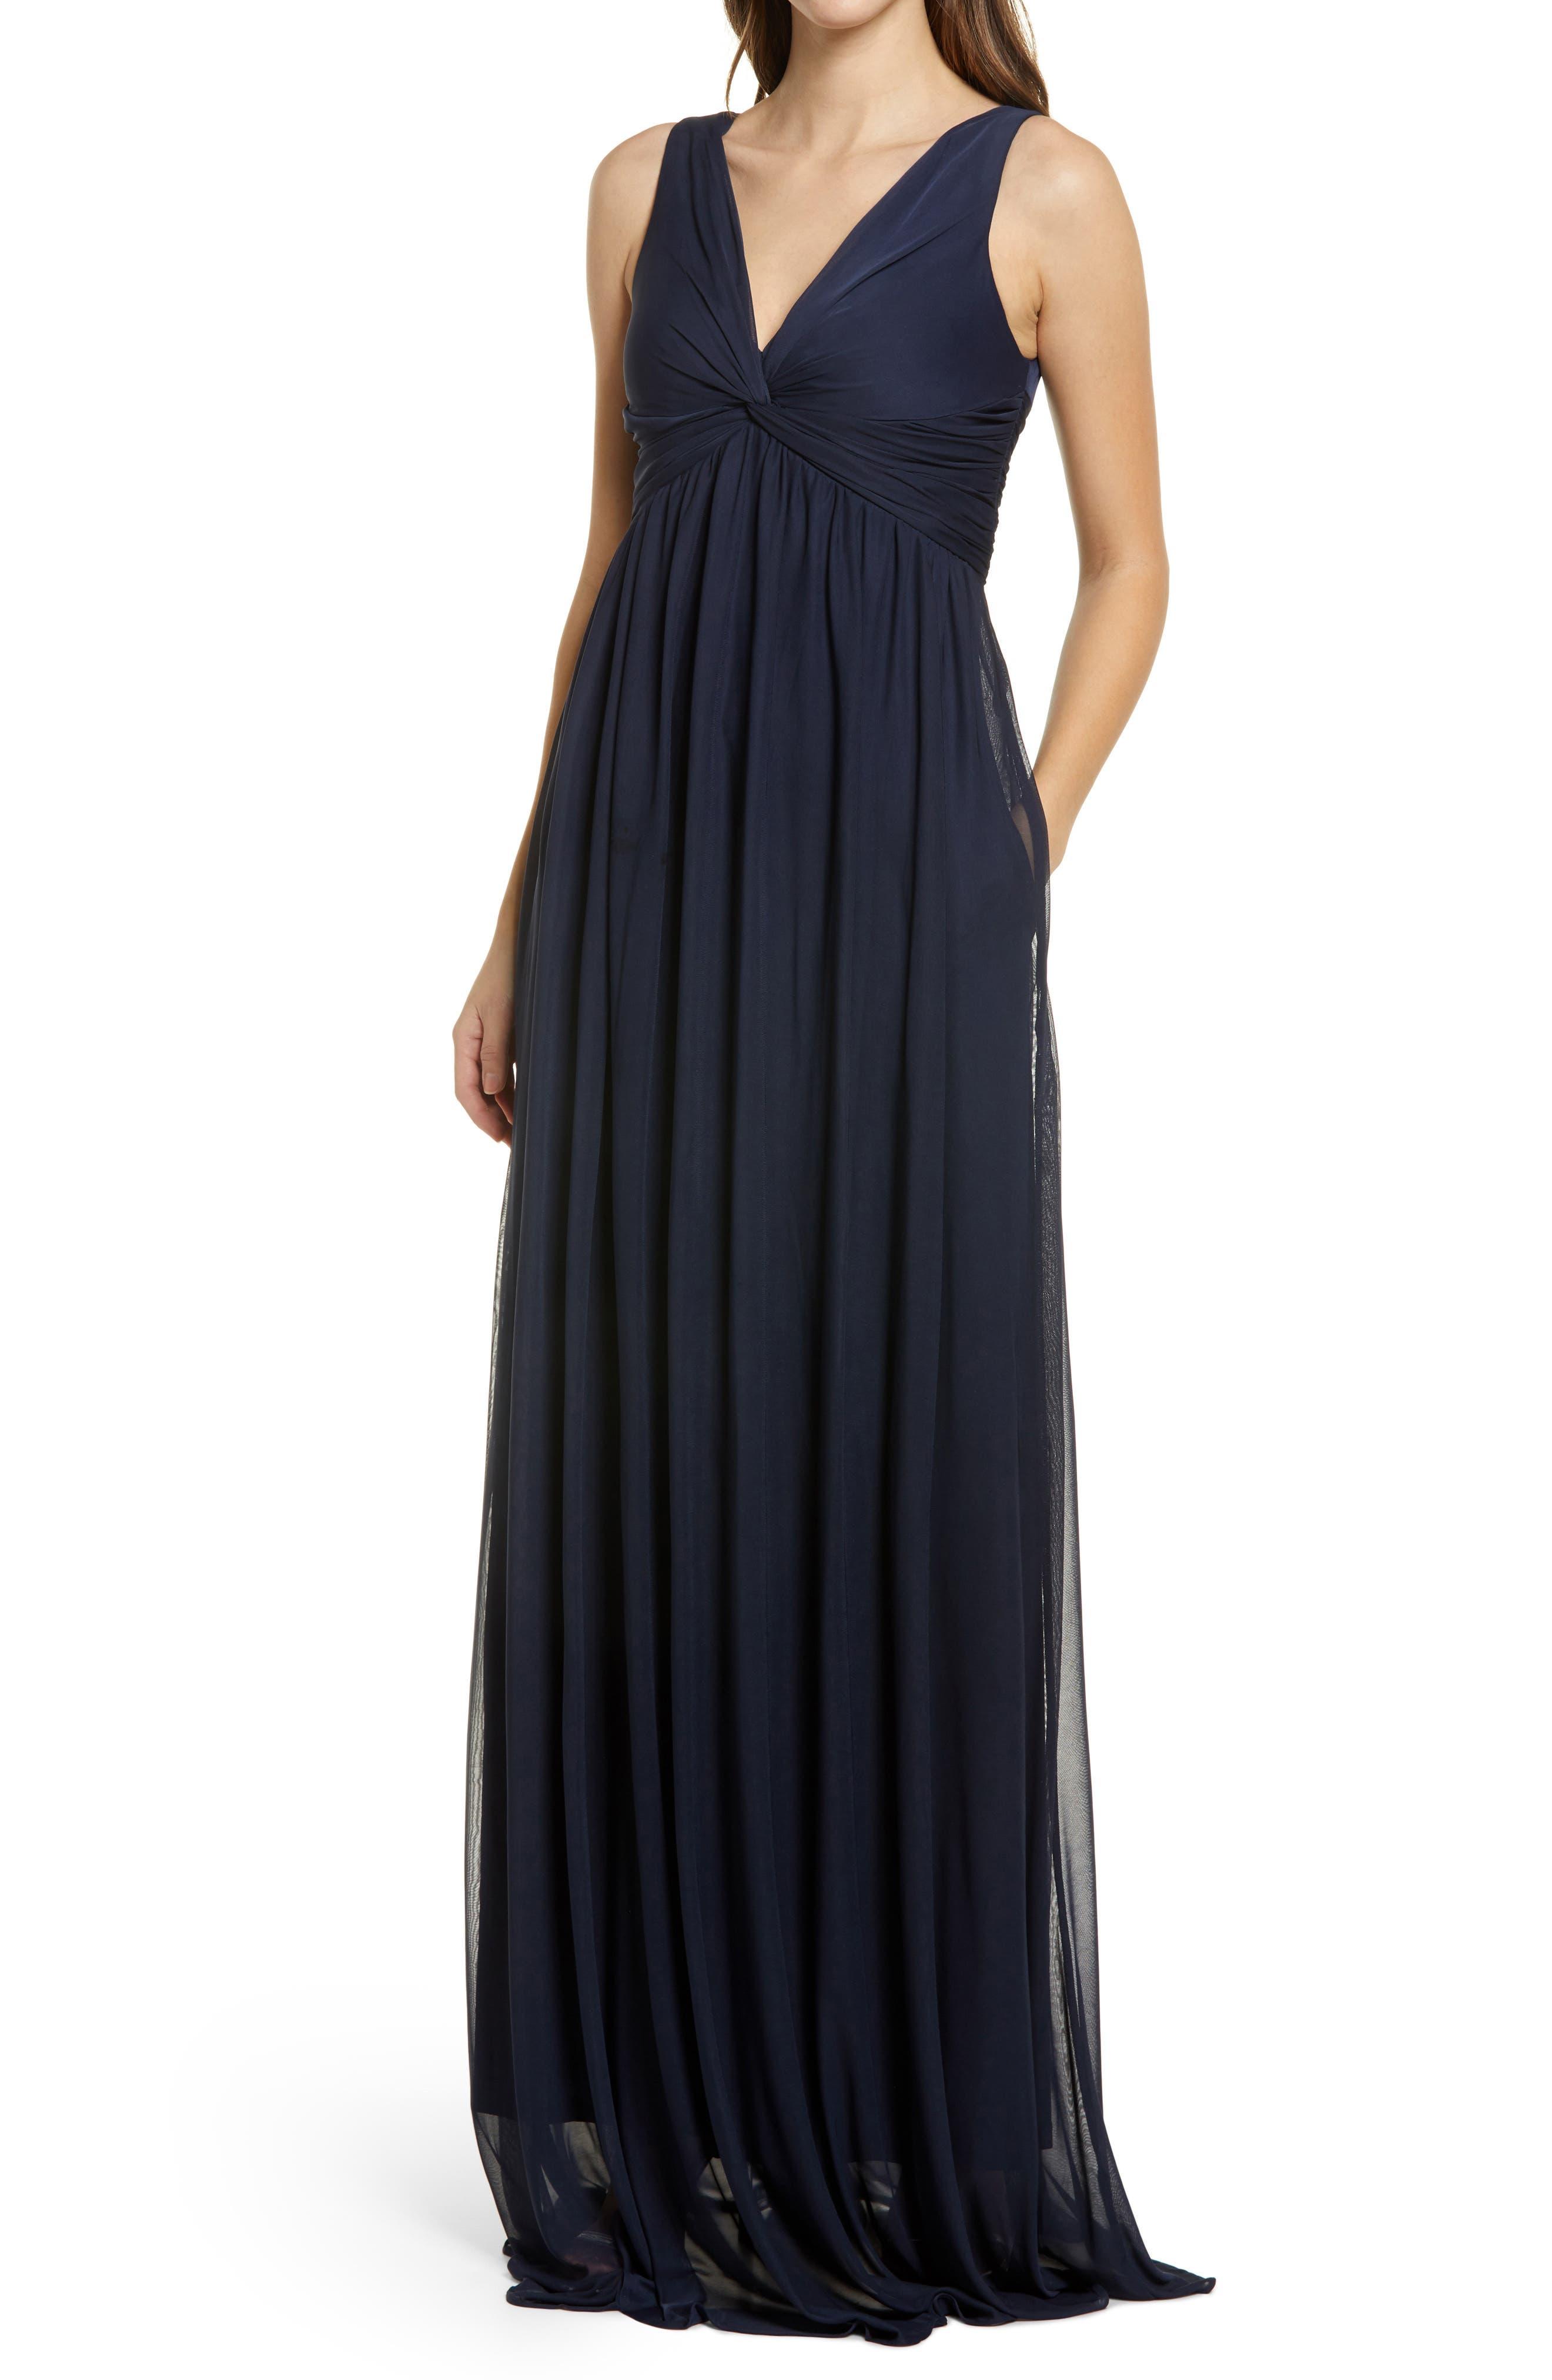 Lianna Empire Waist Sleeveless Gown